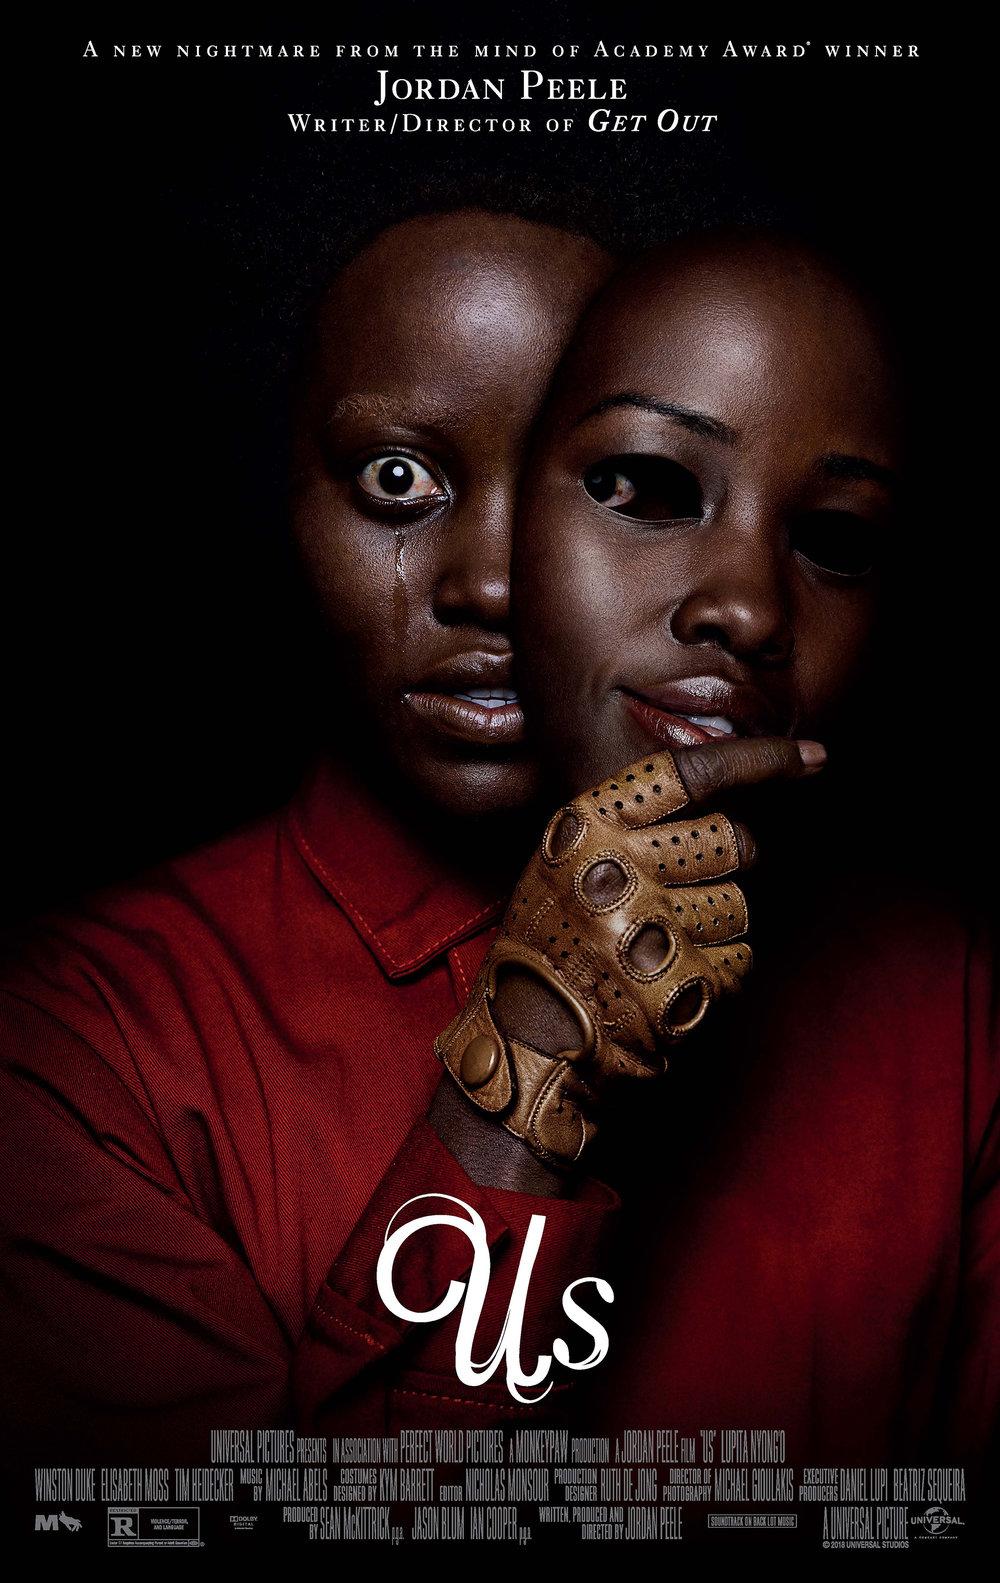 Us   (2019) dir. Jordan Peele Rated: R image: ©2019 Universal Pictures